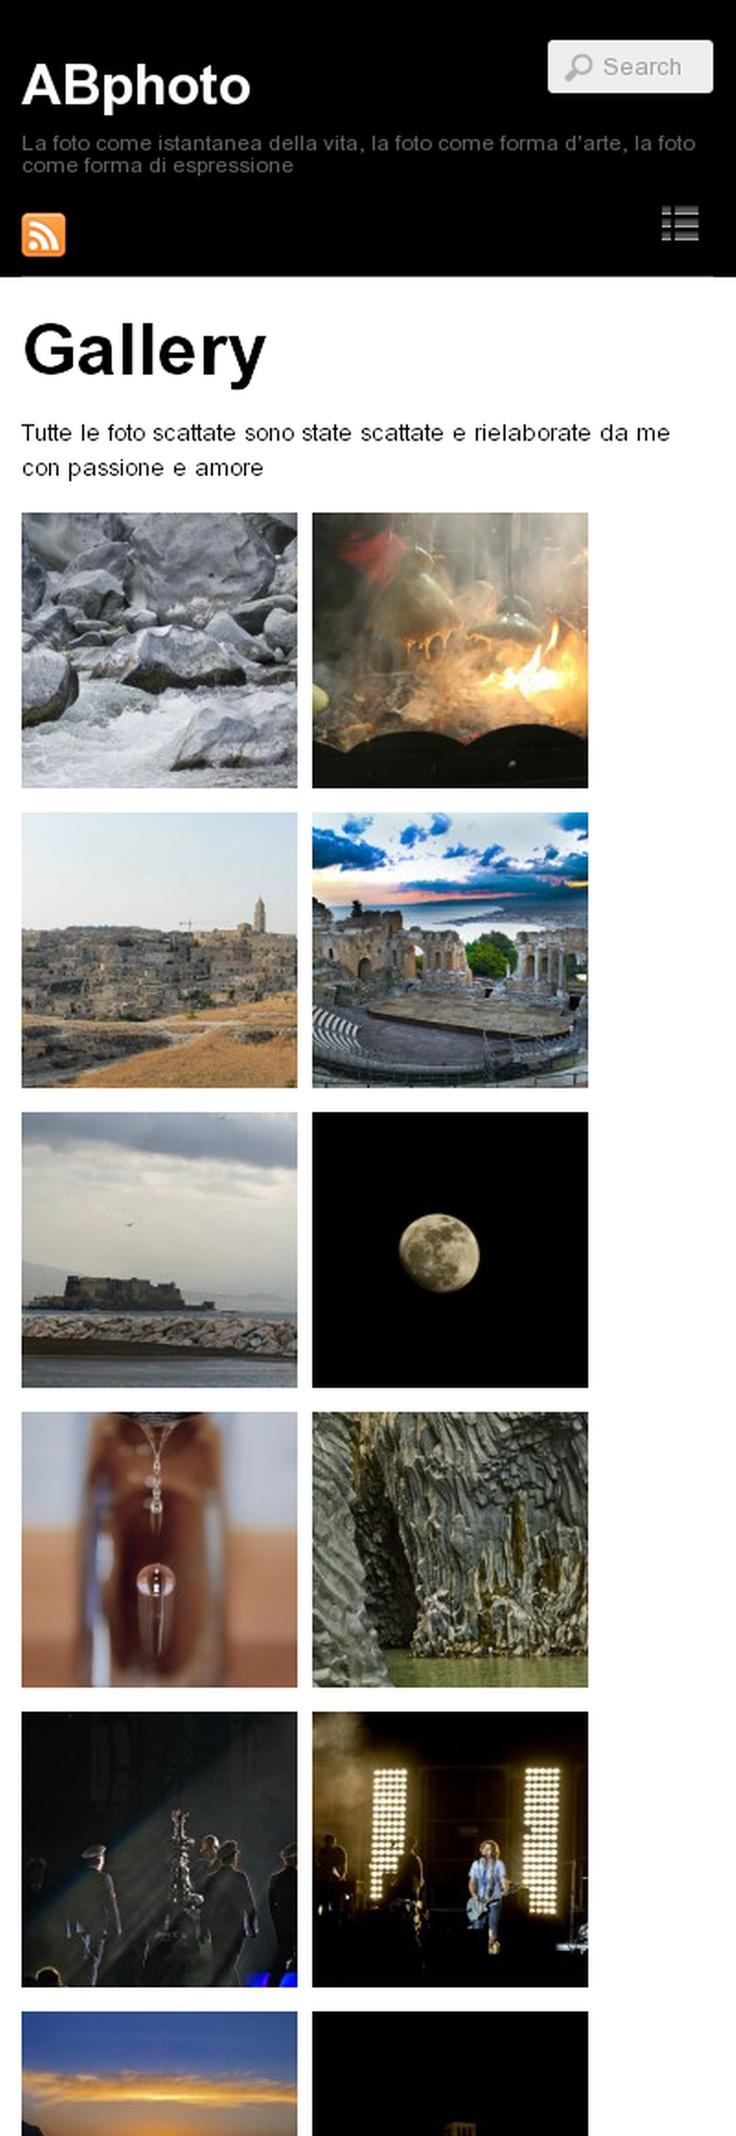 Website http://www.balascoantonio.altervista.org/ snapped on Snapito!